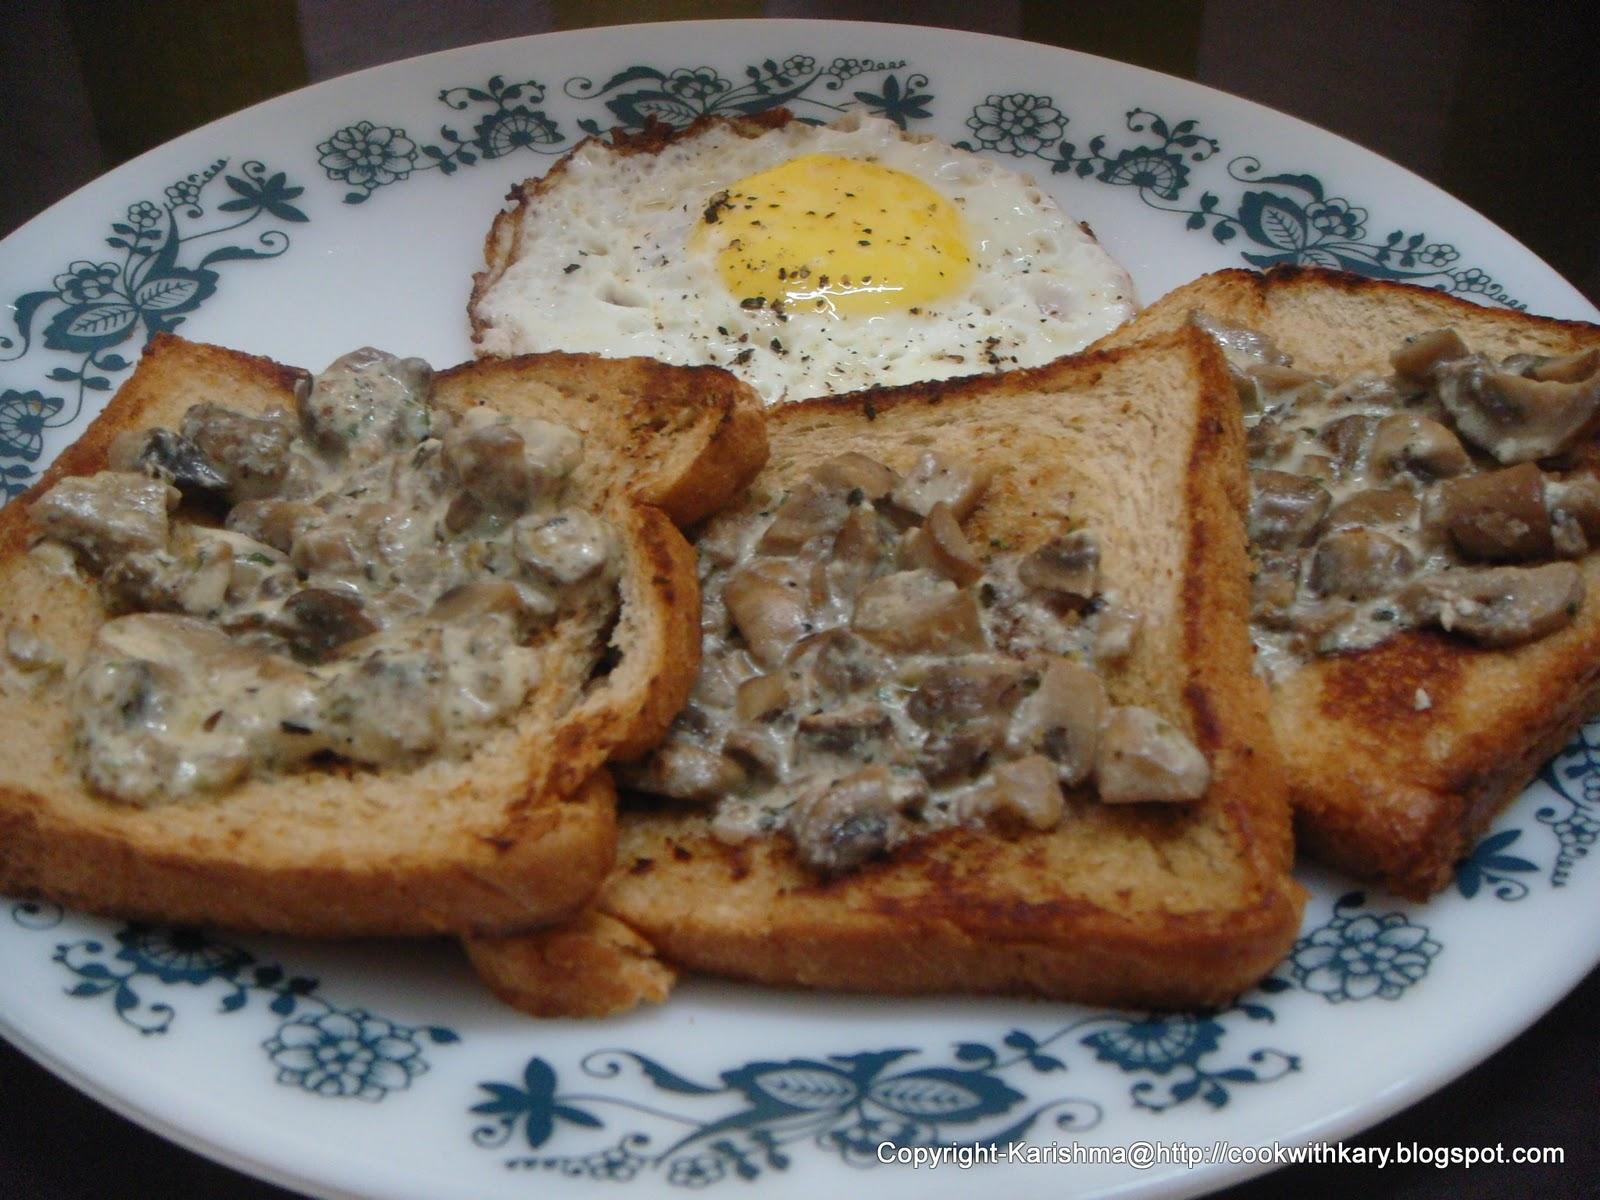 Effortless cooking. Easy baking.: Creamy Mushrooms-On-Toast